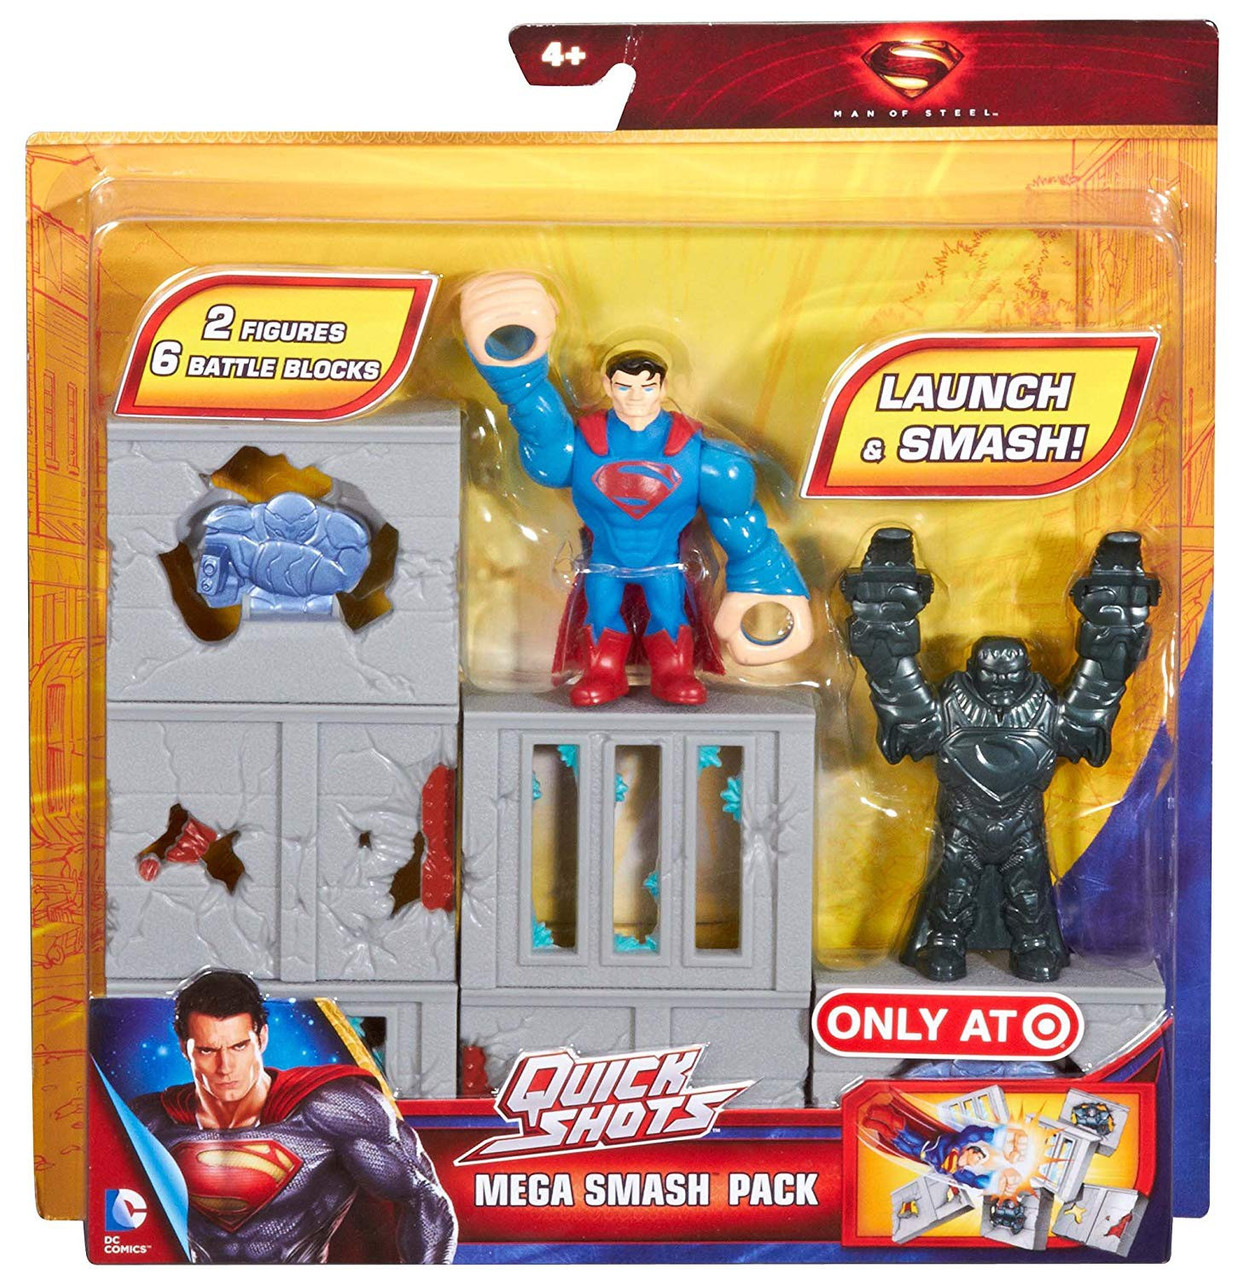 Superman Man of Steel Quickshots Battle for Metropolis Play Set *XMAS TOY GIFT*